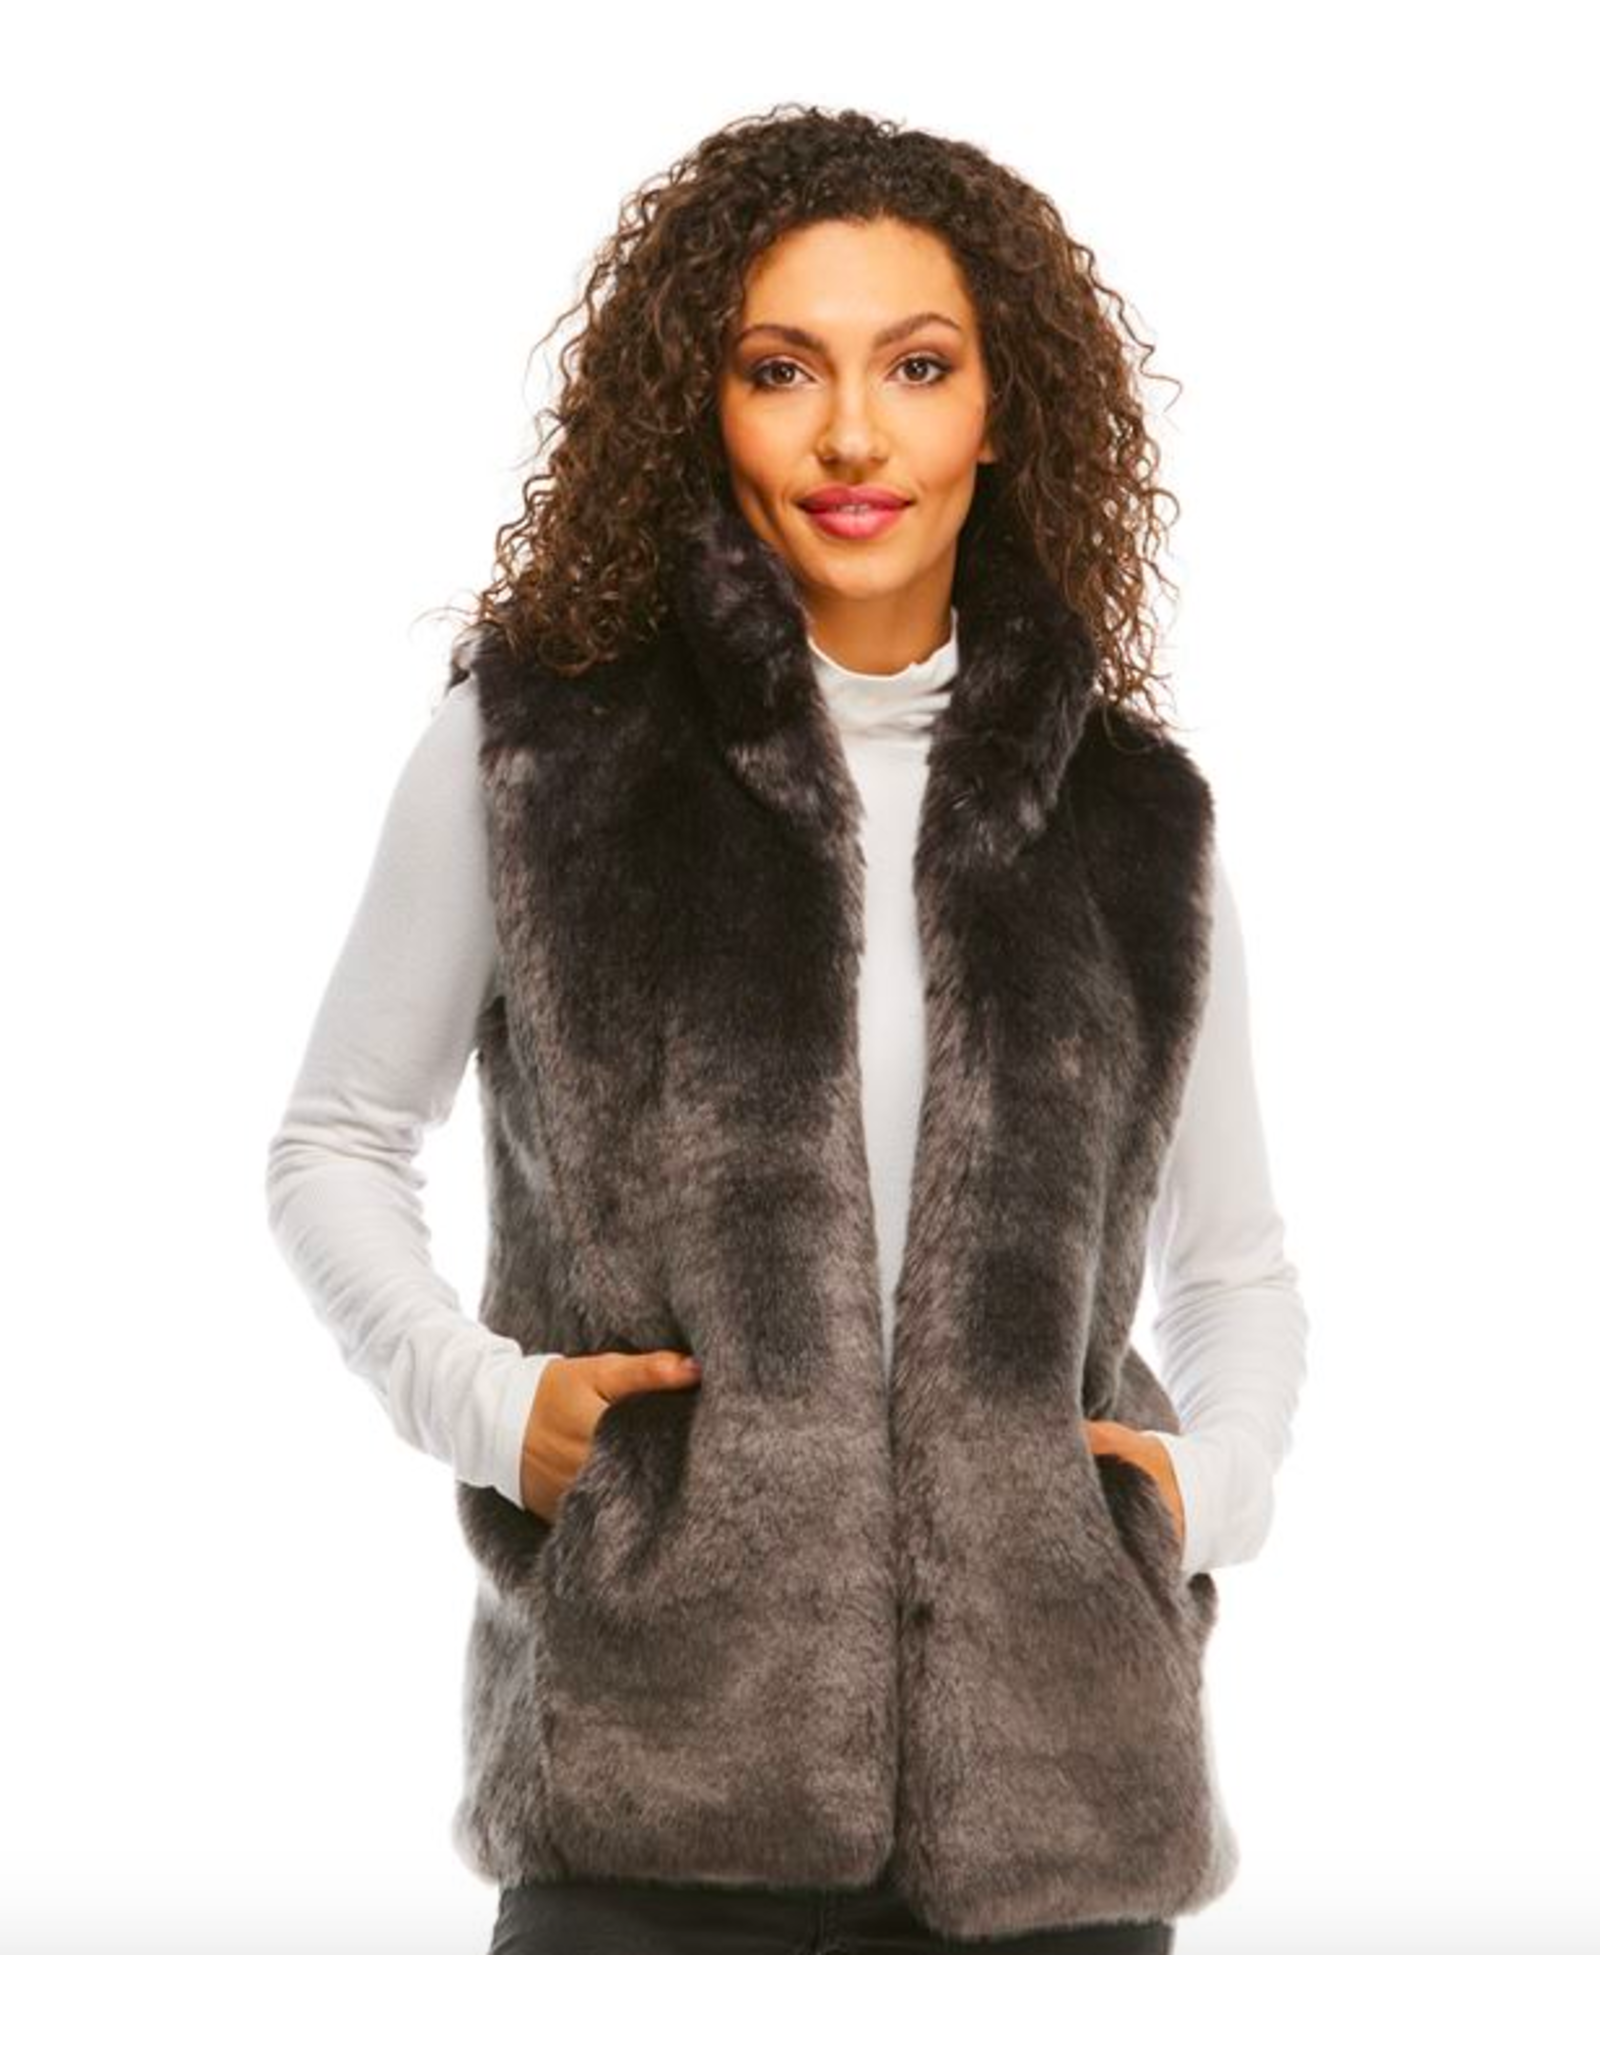 Donna Salyers Fabulous Furs Mink Couture Faux Fur Hook Vest in Graphite Size Small